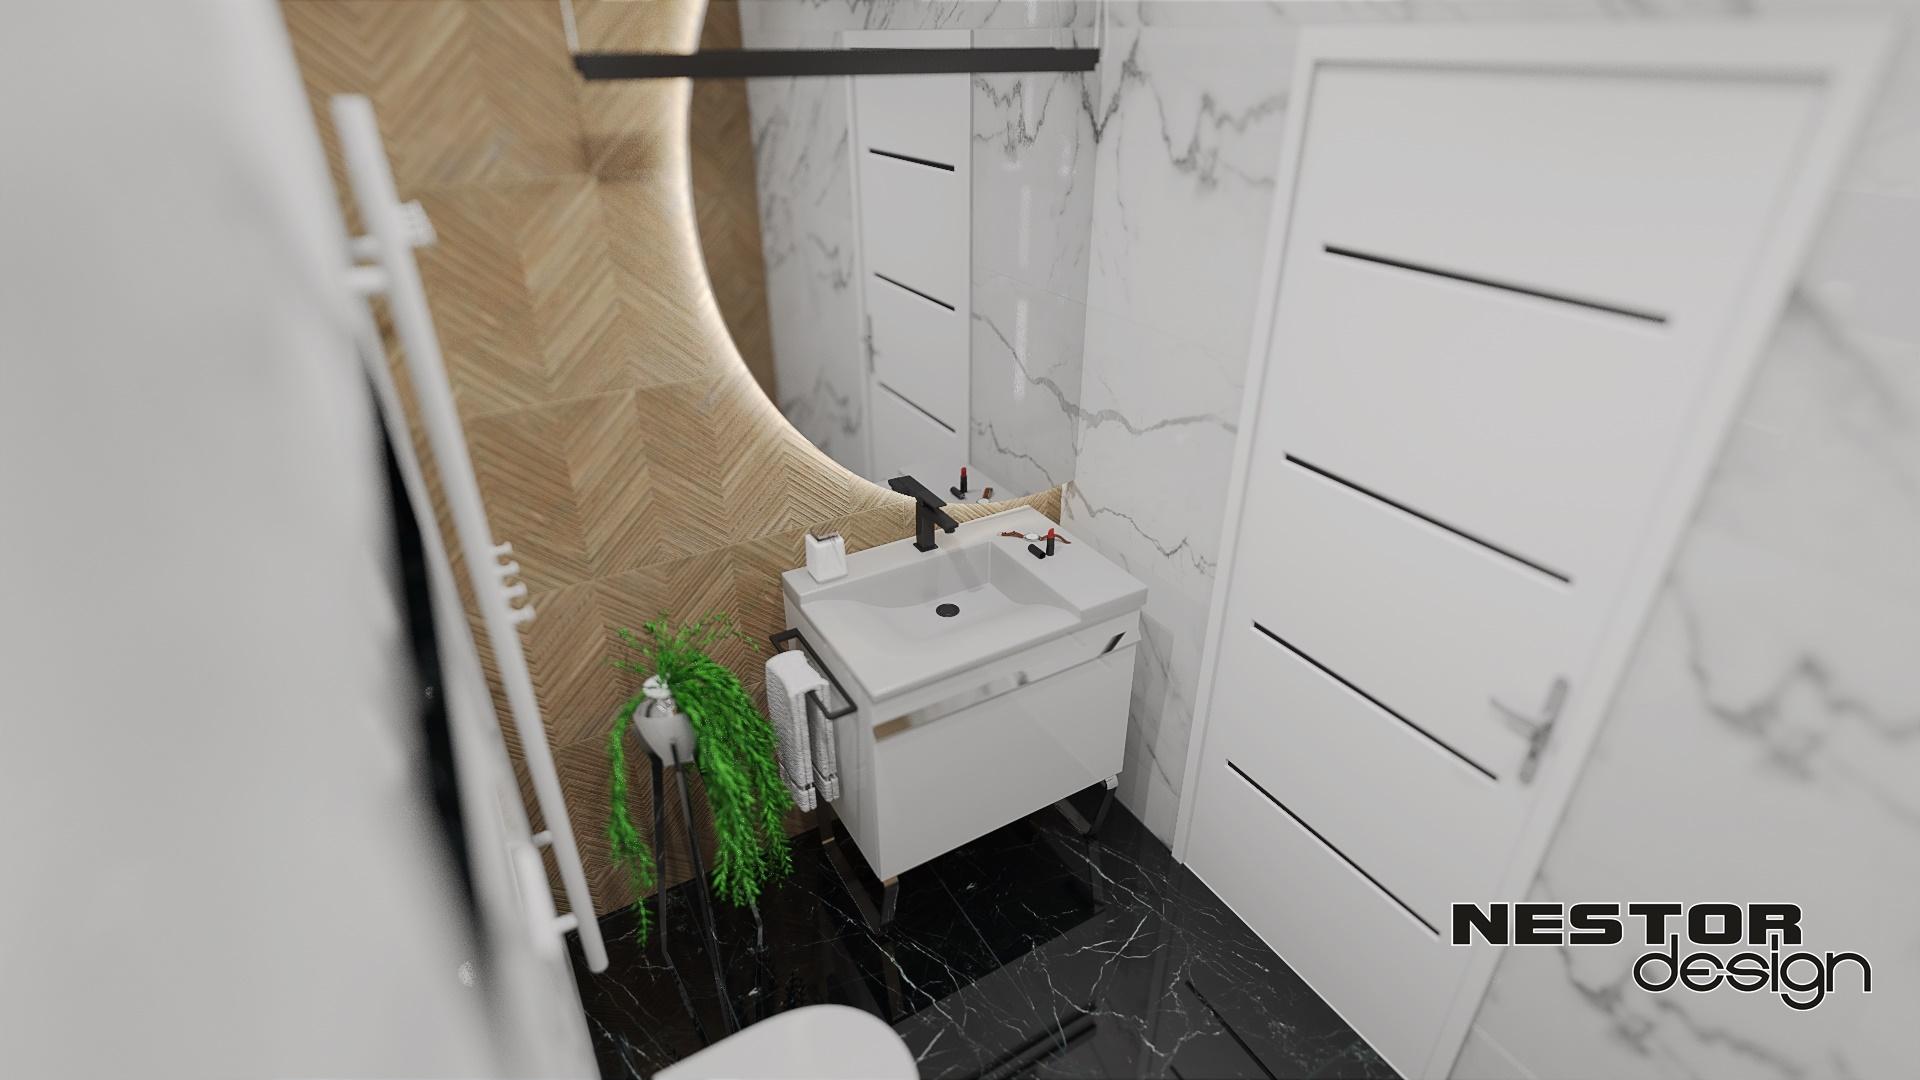 osiedle kalinka A27 ticore negro wood nestor design 7